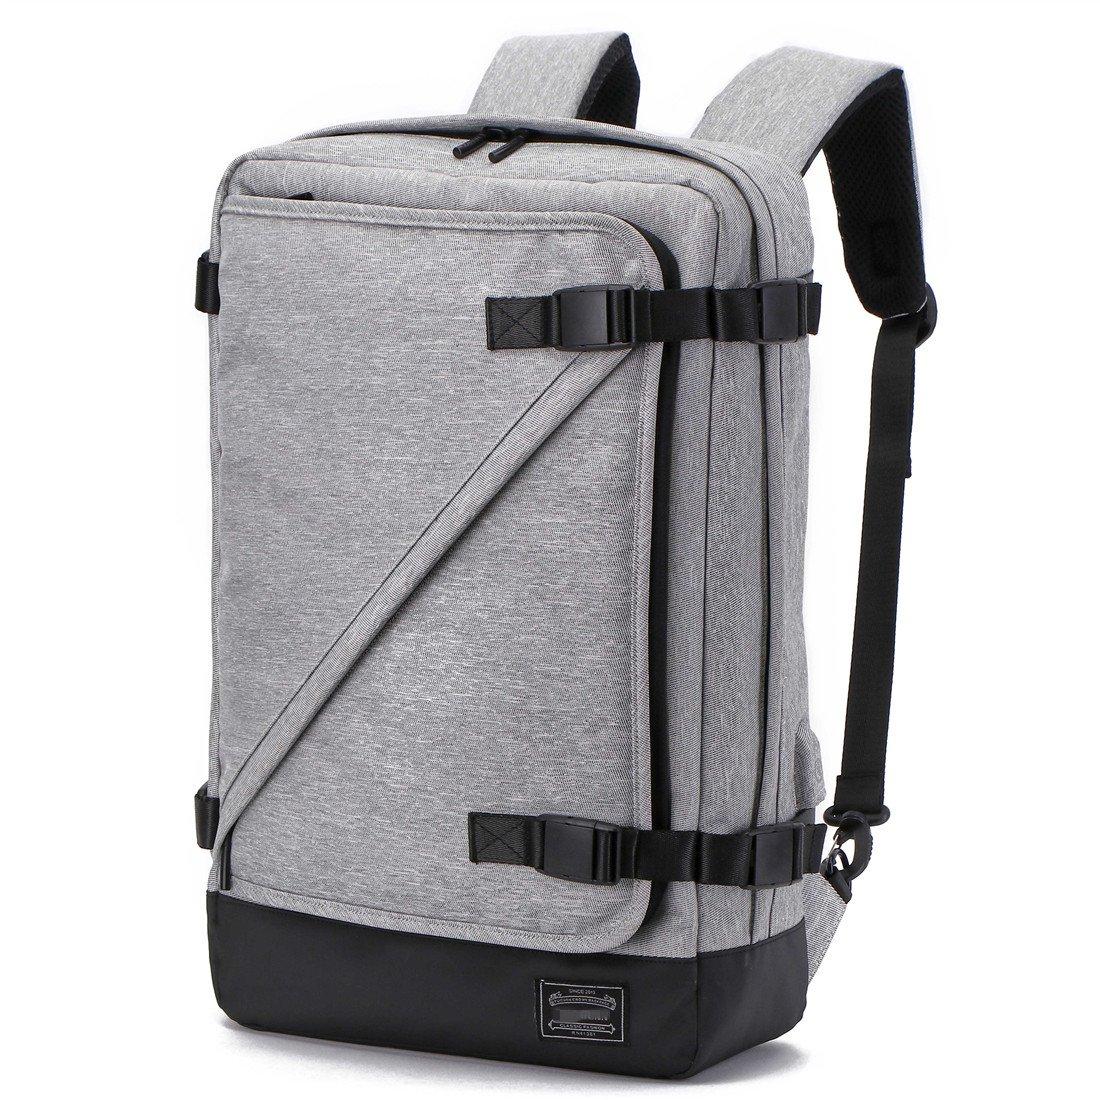 KEYNEW Convertible Biefcase Laptop Backpack Shoulder Daypack USB Charging for Work School Trip, 3 Carrying Way EL117-118